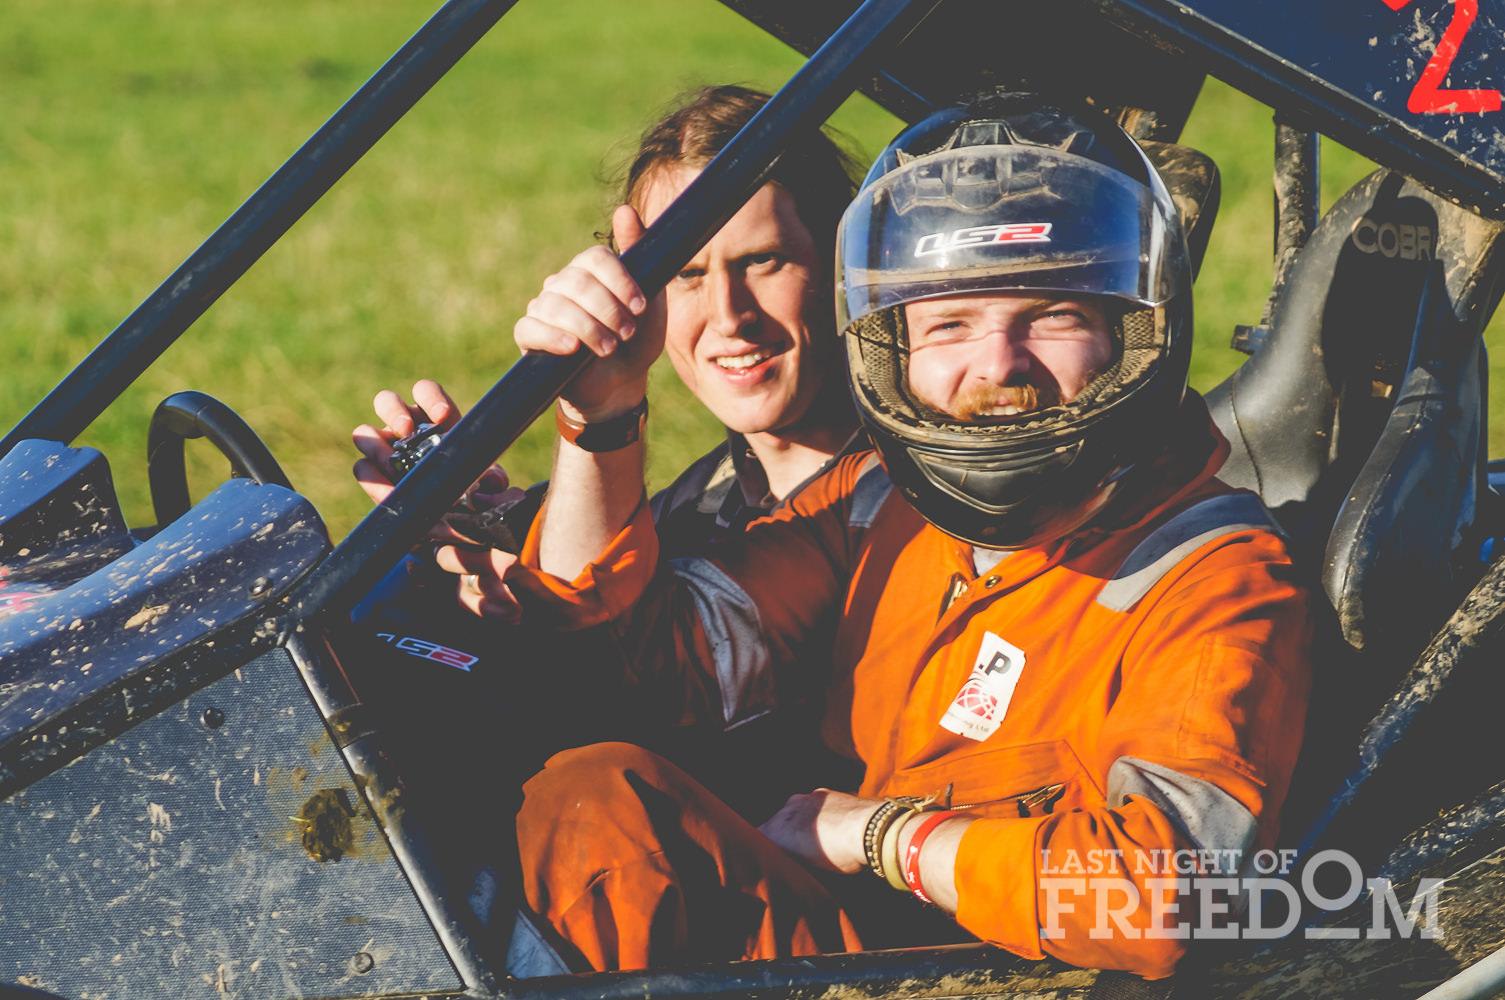 Two men in a rage buggy, one wearing a helmet